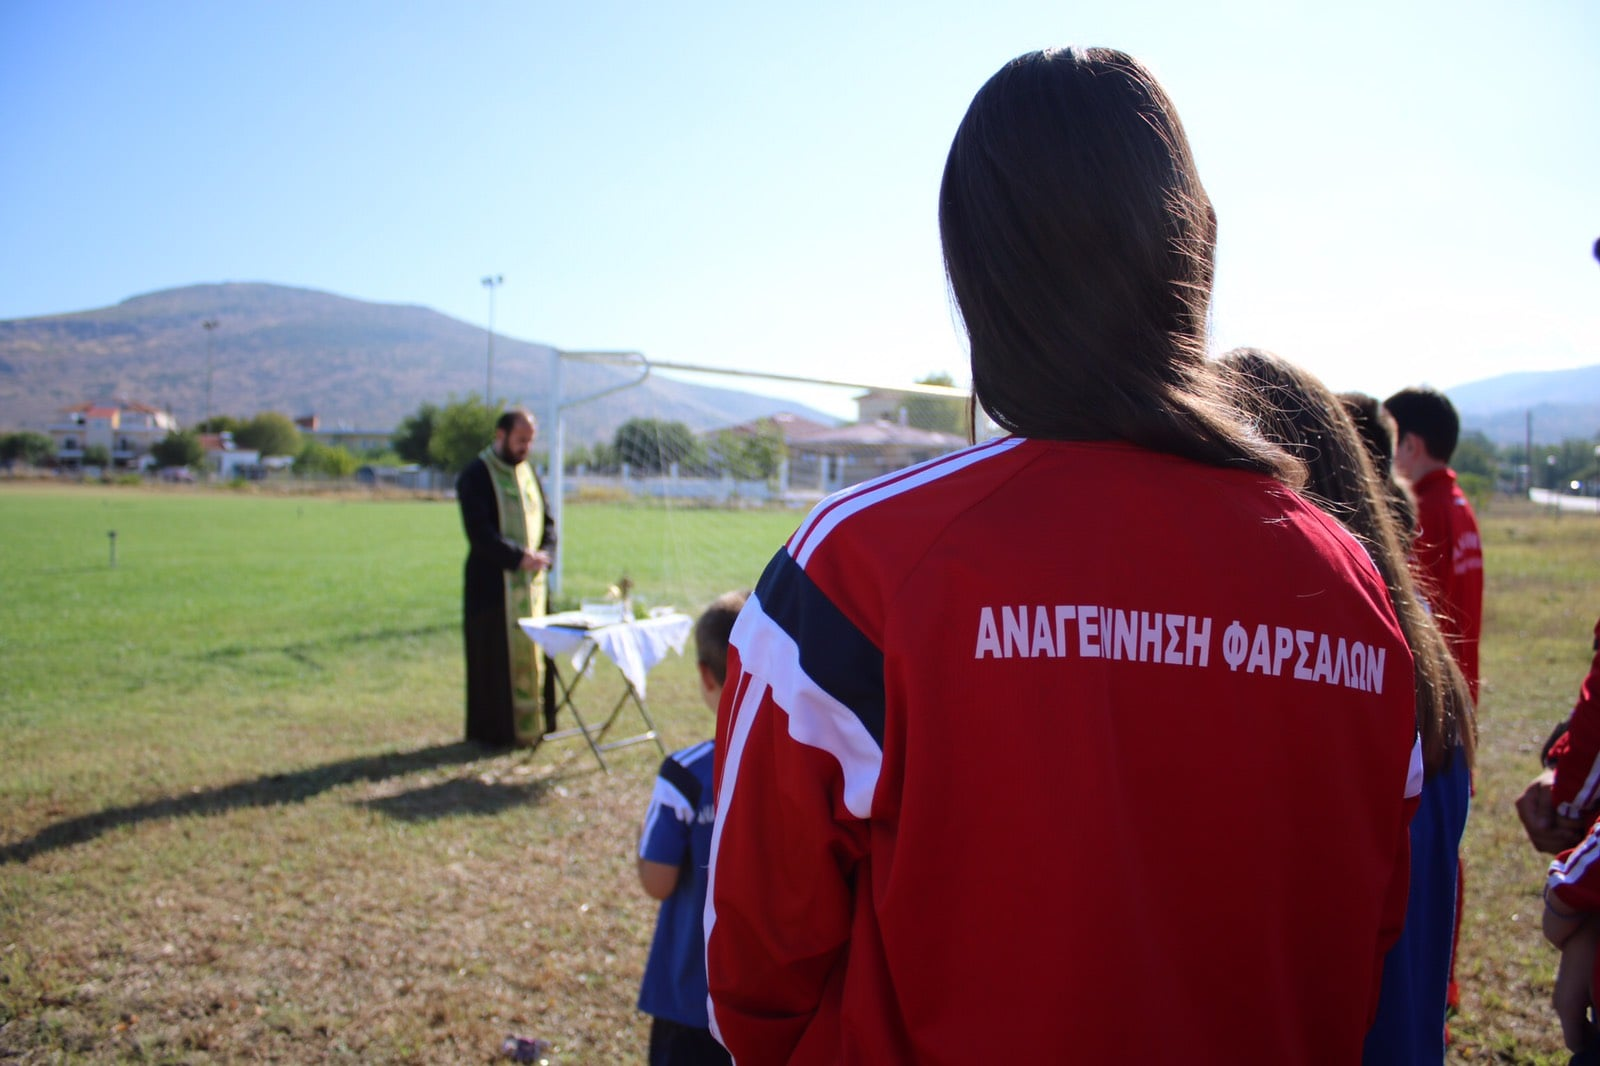 Photo of Αγιασμός για την Ακαδημία ποδοσφαίρου της Αναγέννησης Φαρσάλων